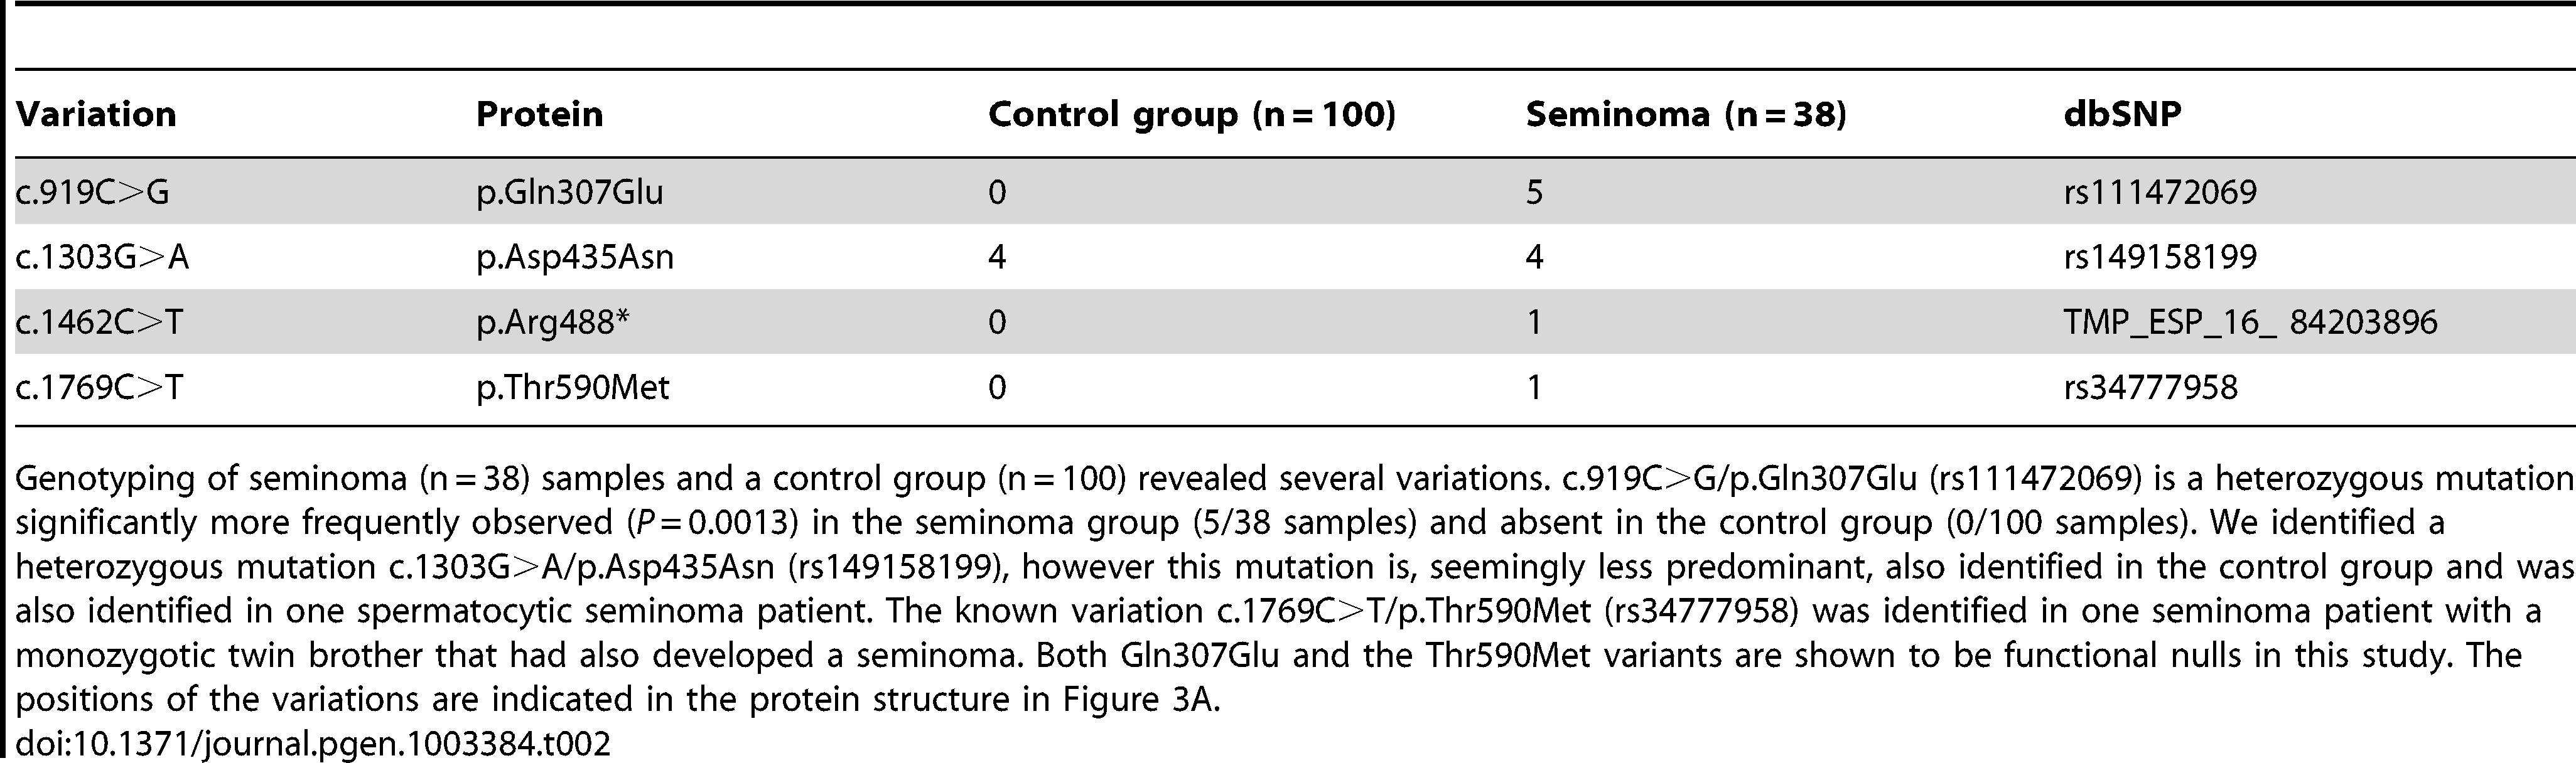 Genetic variation of <i>LRRC50</i> in human seminomas.